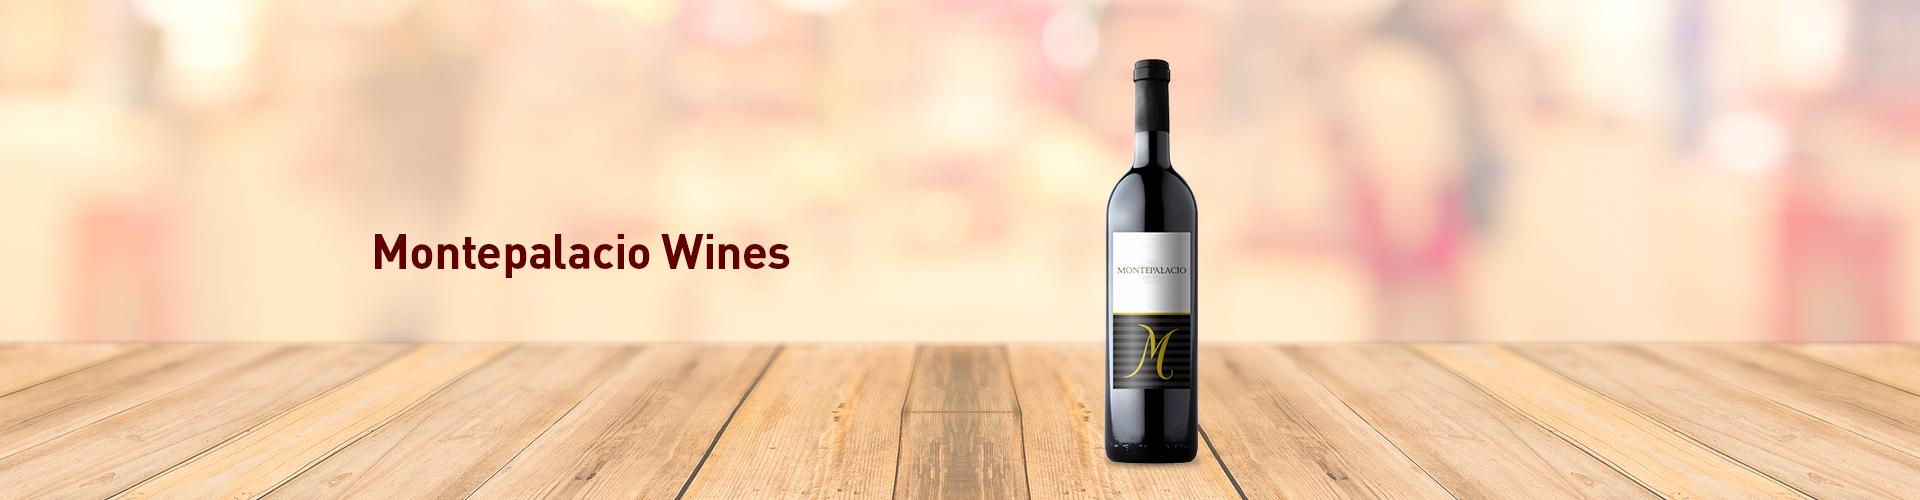 Montepalacio Wines